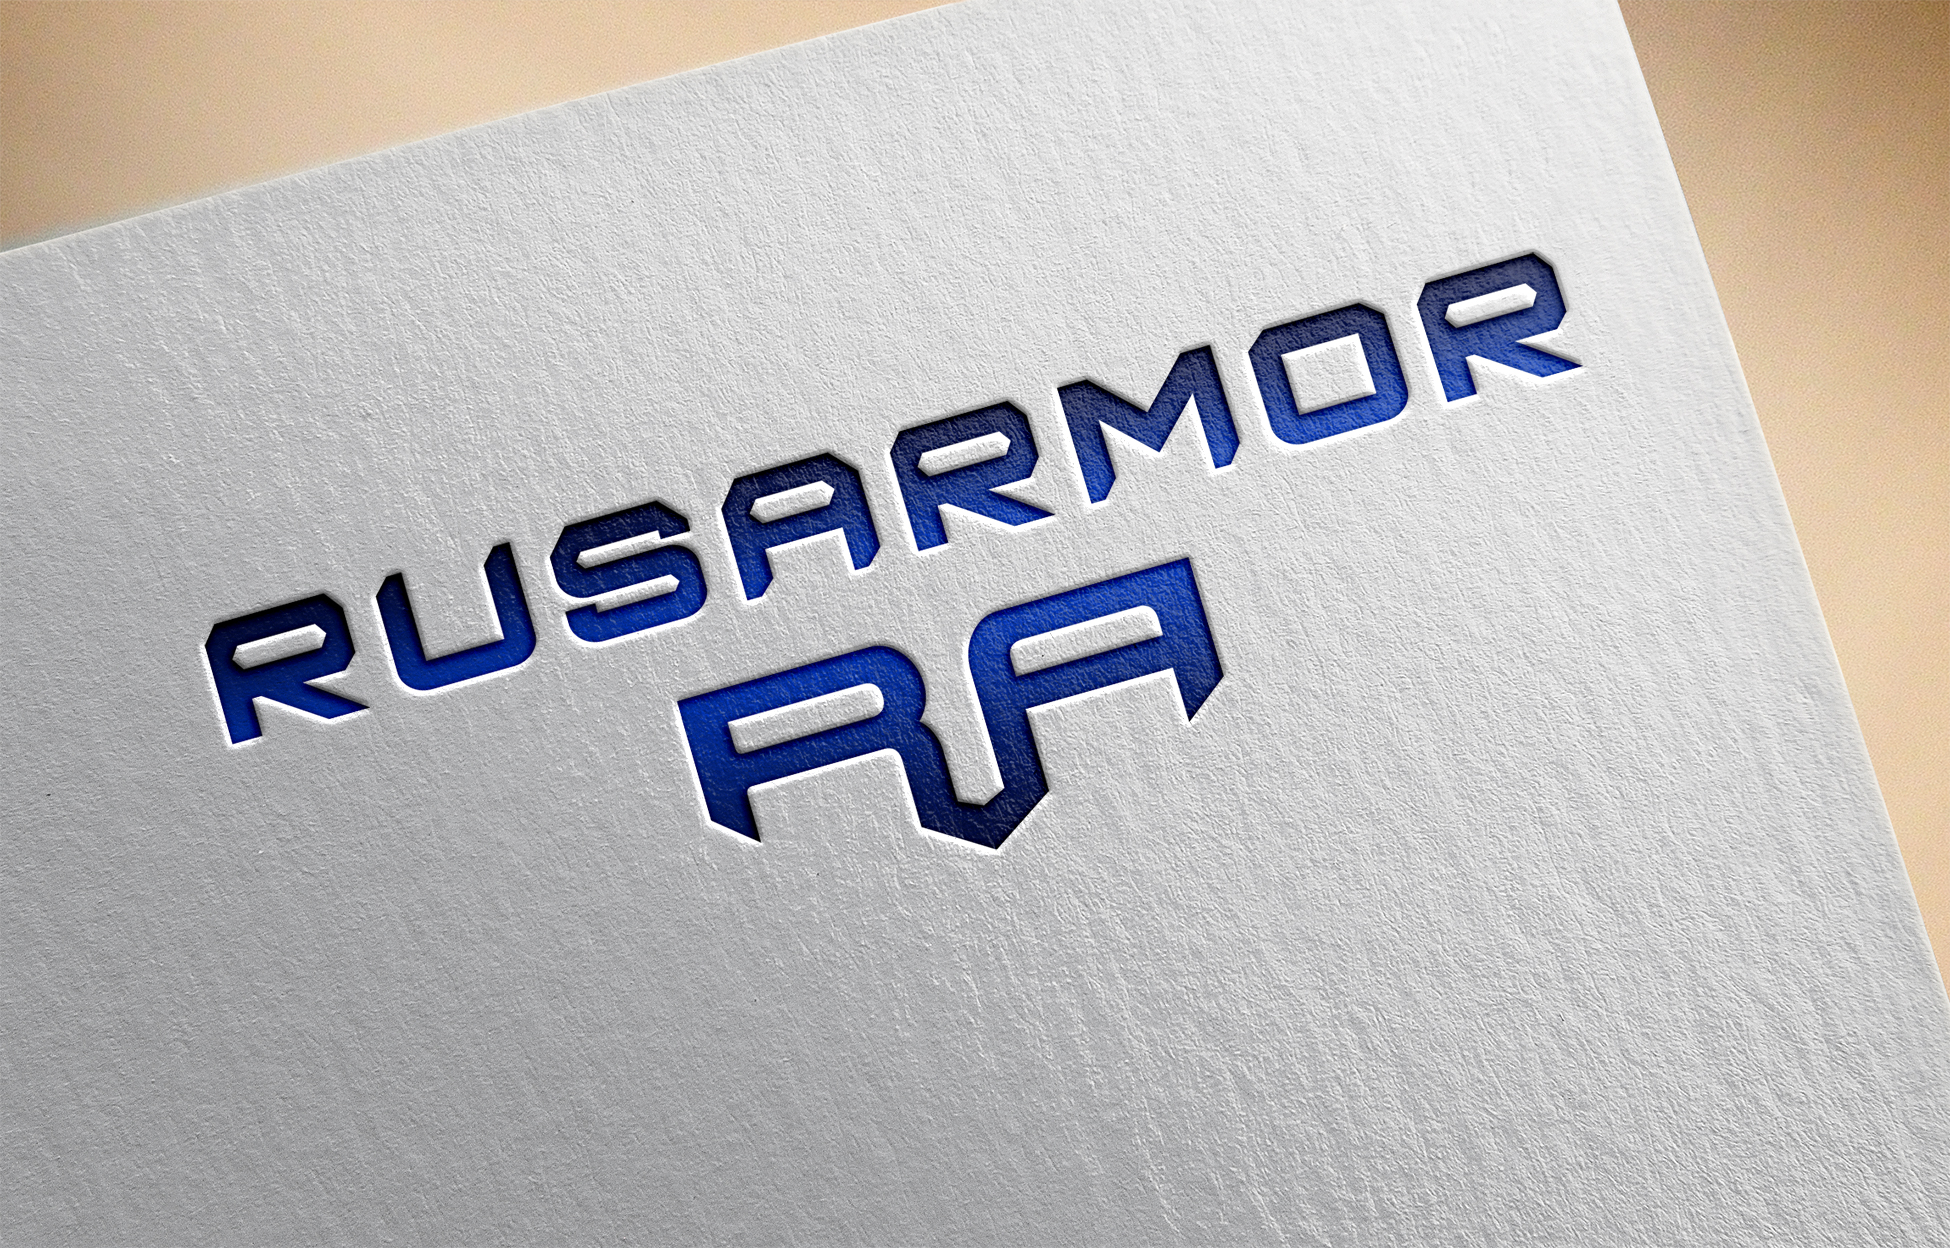 Разработка логотипа технологического стартапа РУСАРМОР фото f_0395a0f42ace5152.jpg